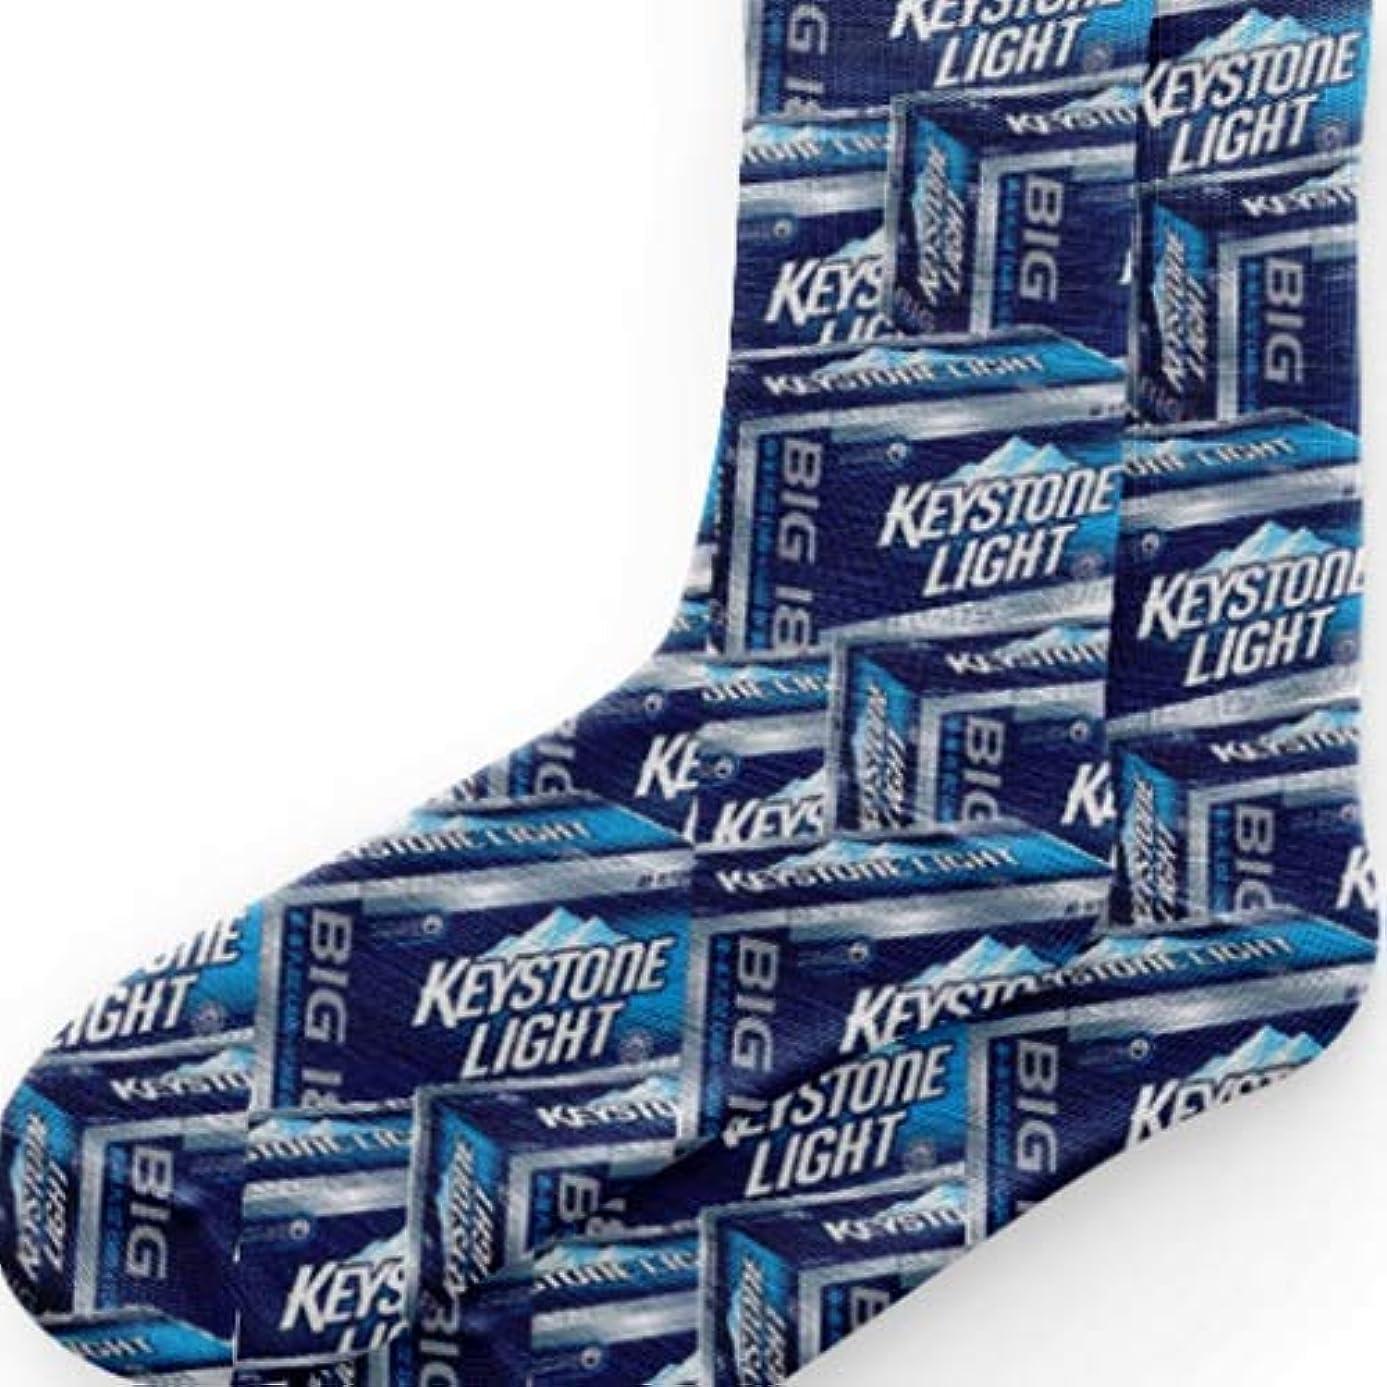 Keystone Light Socks - Keystone Socks - Beer Design Socks